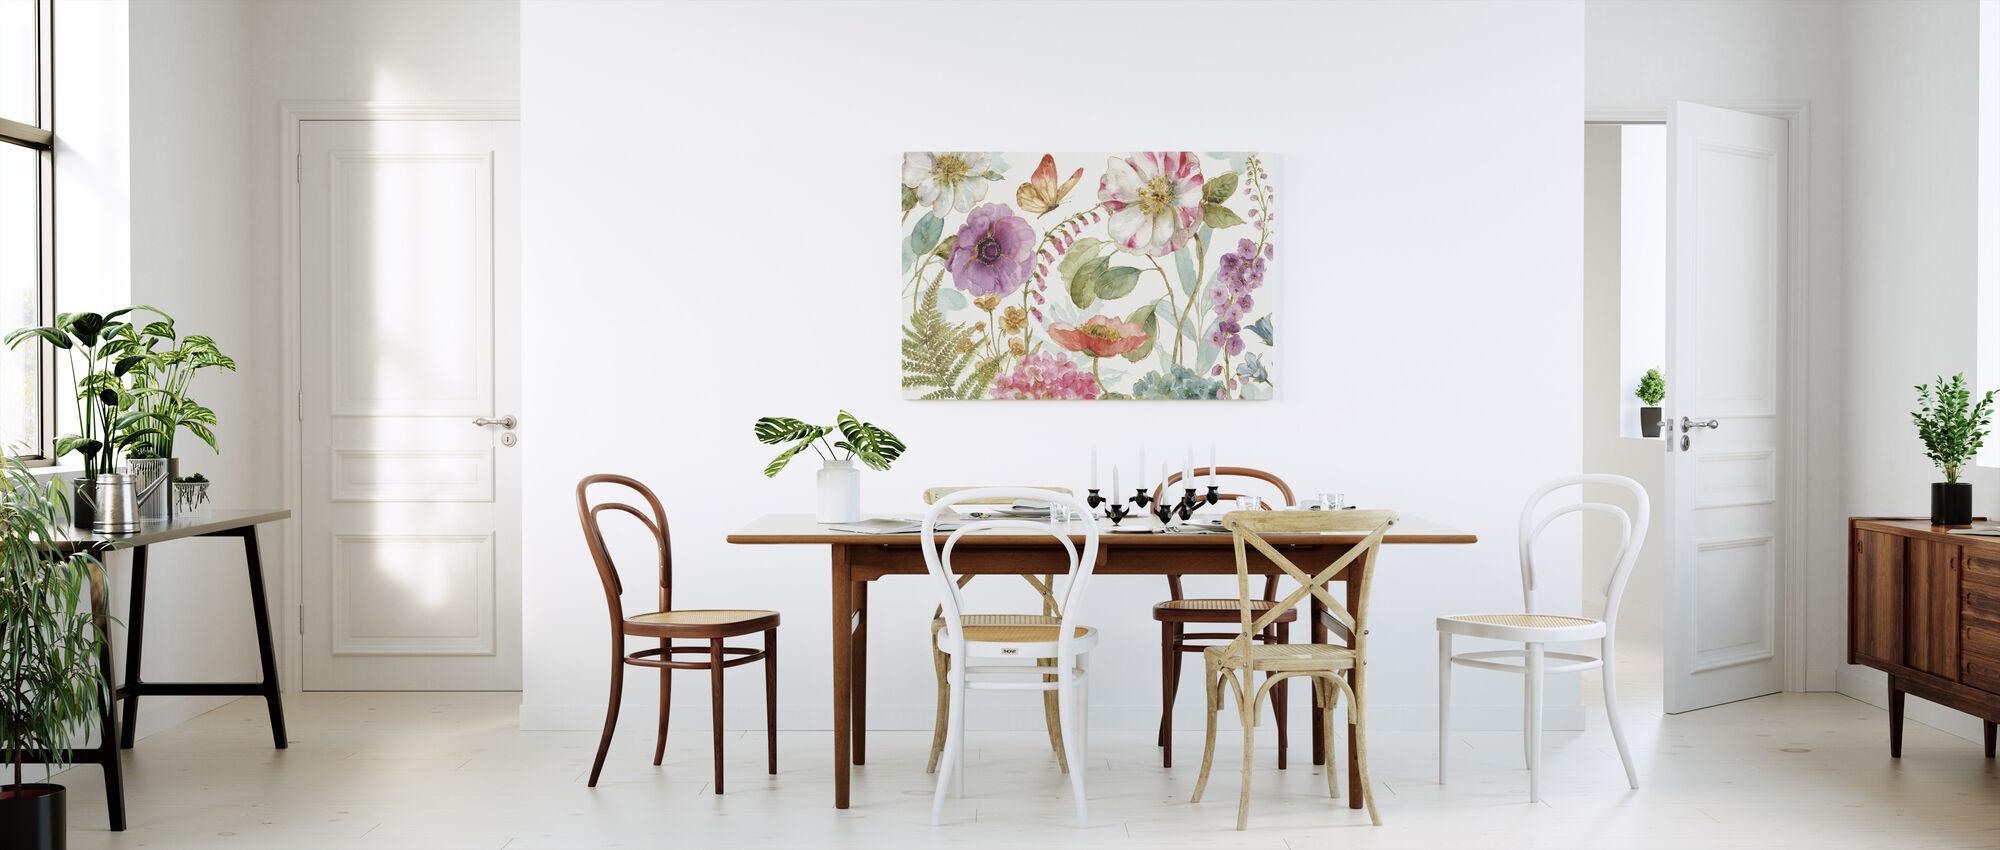 Regnbåge Frön Blommor 1 - Canvastavla - Kök